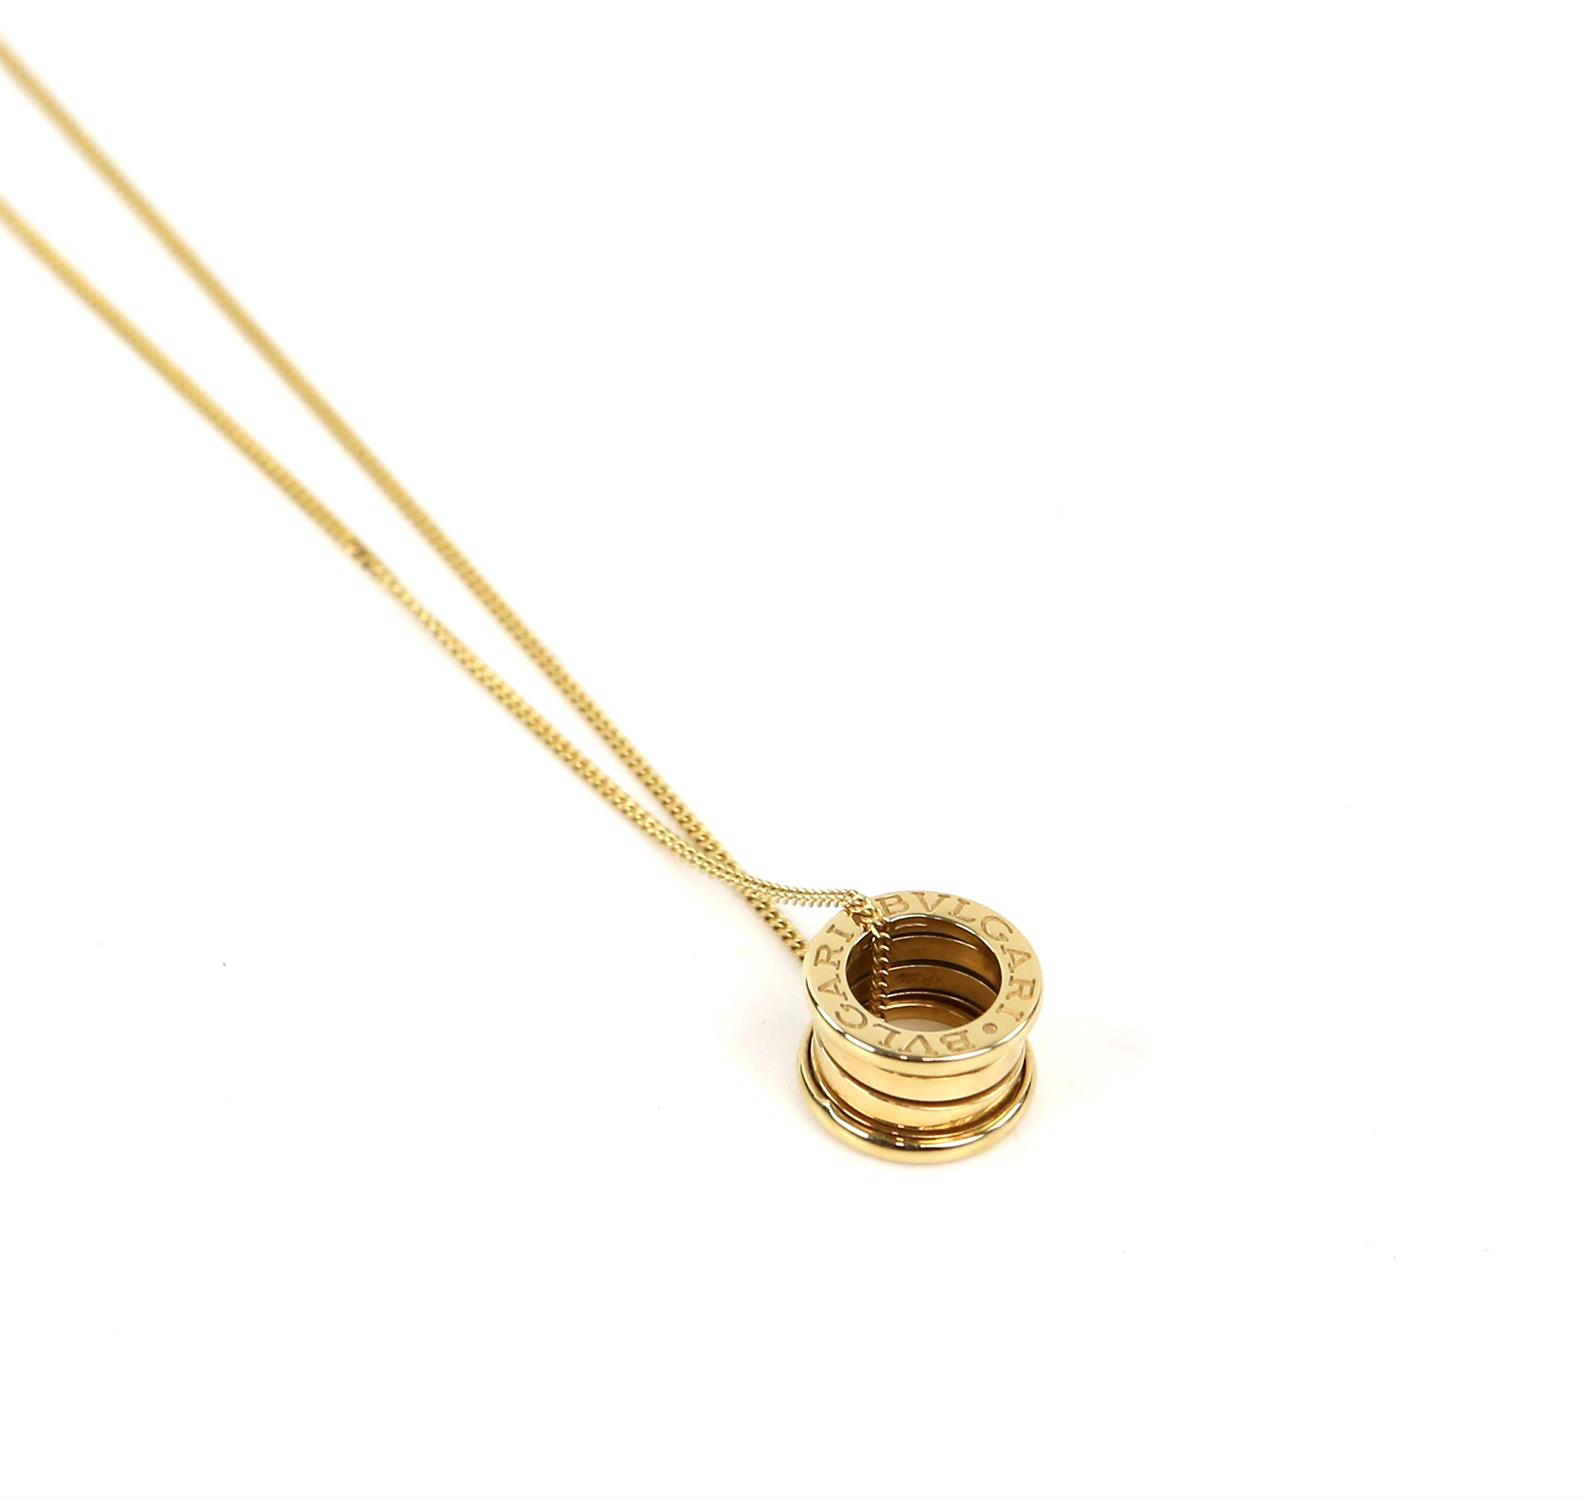 Bvlgari B.Zero1 small round pendant, in 18 ct yellow gold, marked Made in Italy 750 with Bvlgari - Image 2 of 5